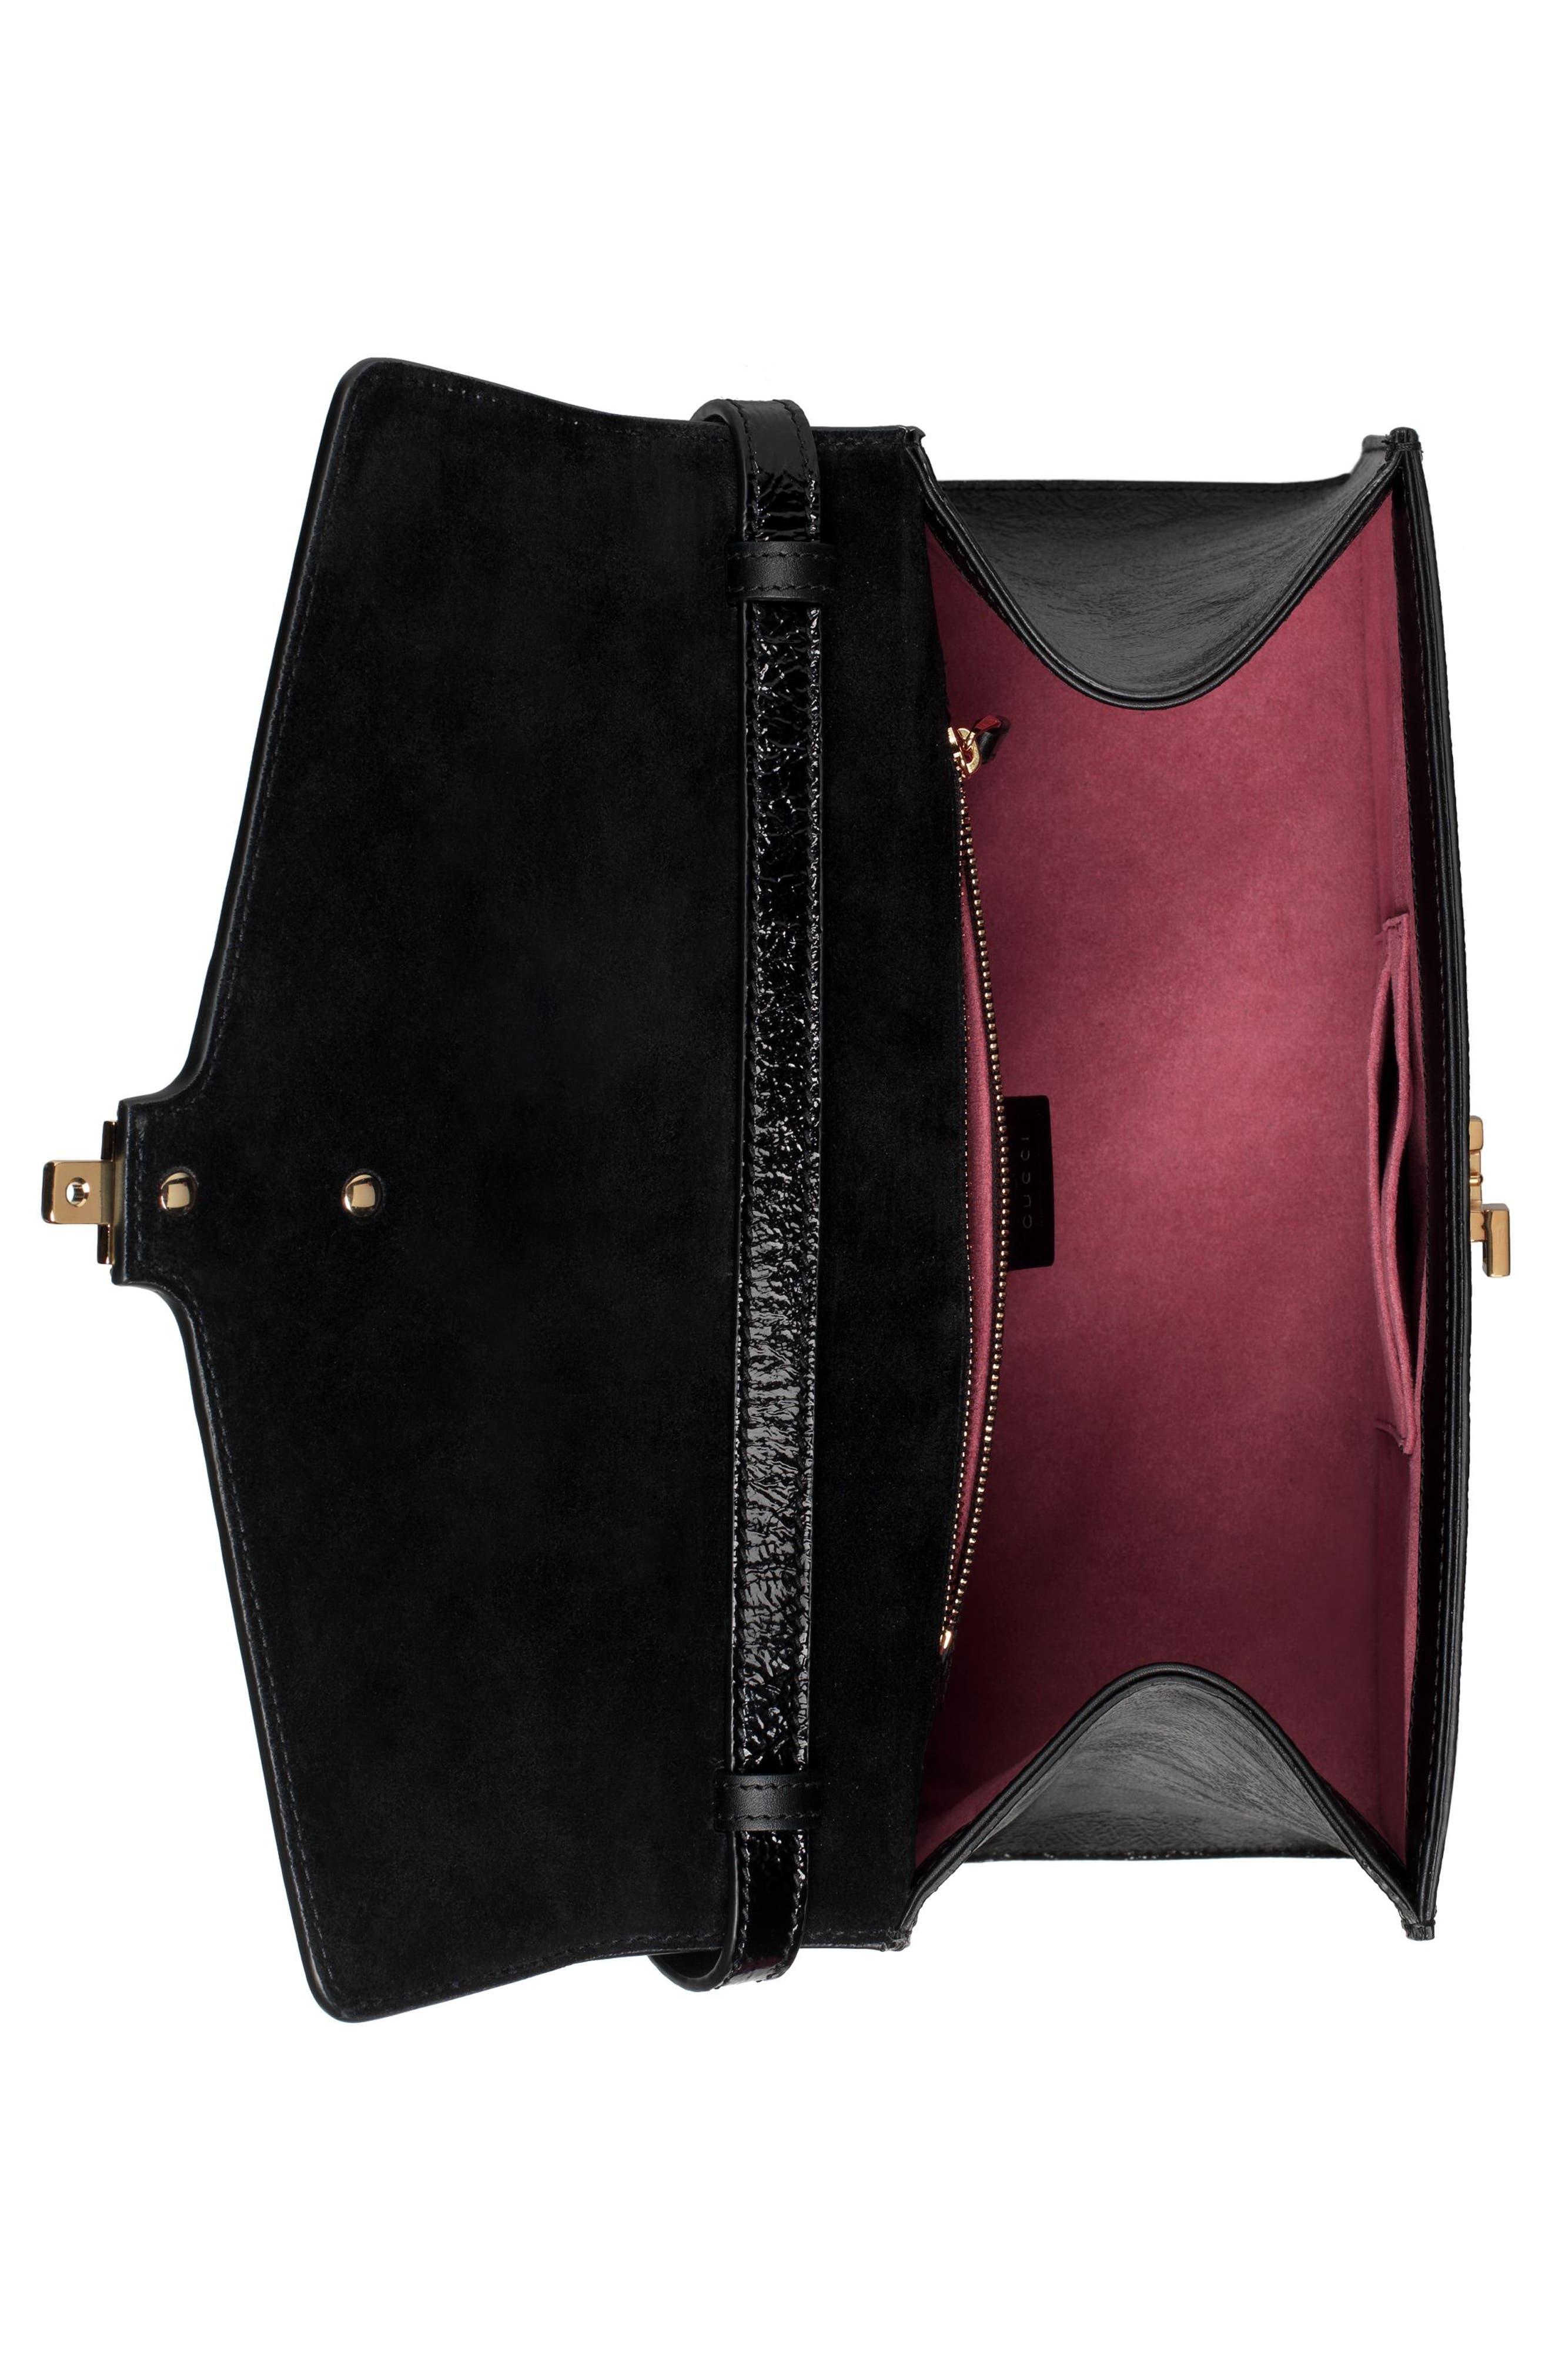 Medium Sylvie Floral Embroidered Top Handle Leather Shoulder Bag,                             Alternate thumbnail 3, color,                             Nero Multi